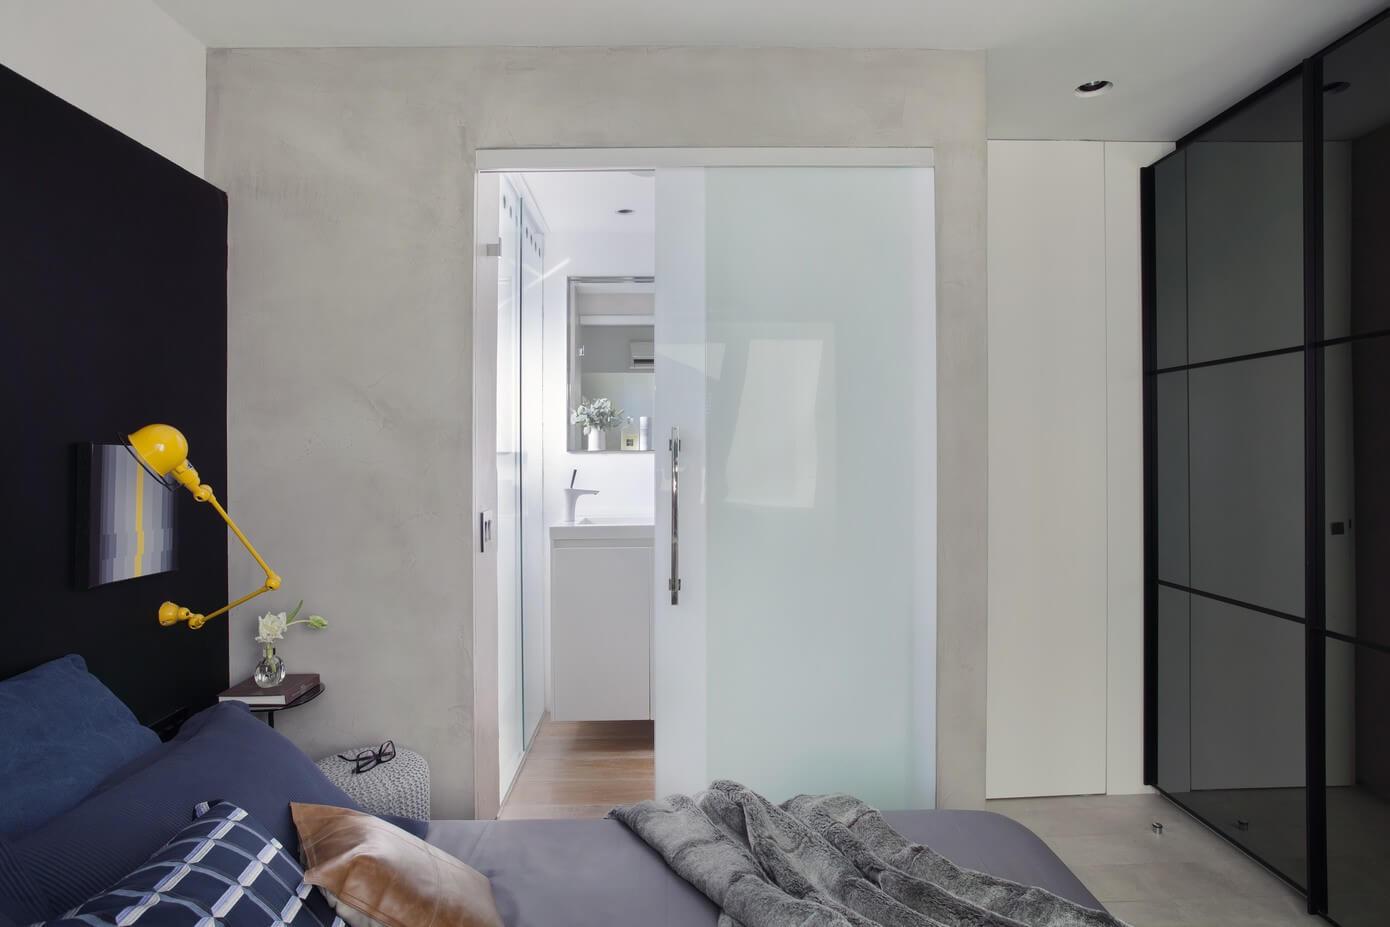 светъл и изчистен двустаен апартамент_roca_17